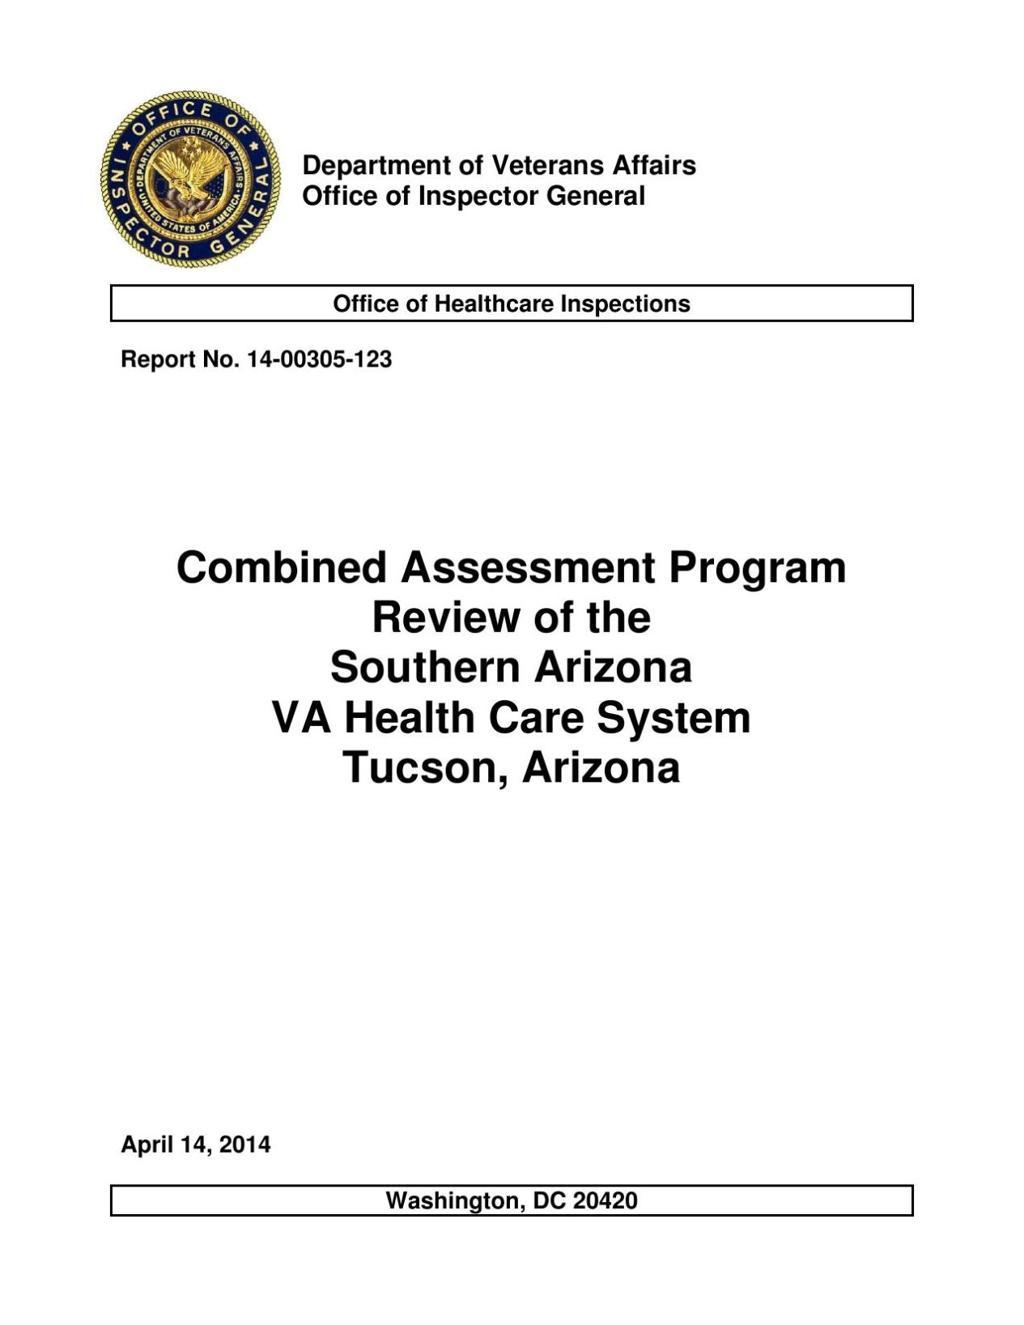 Tucson VA hospital outperforms Phoenix in internal quality